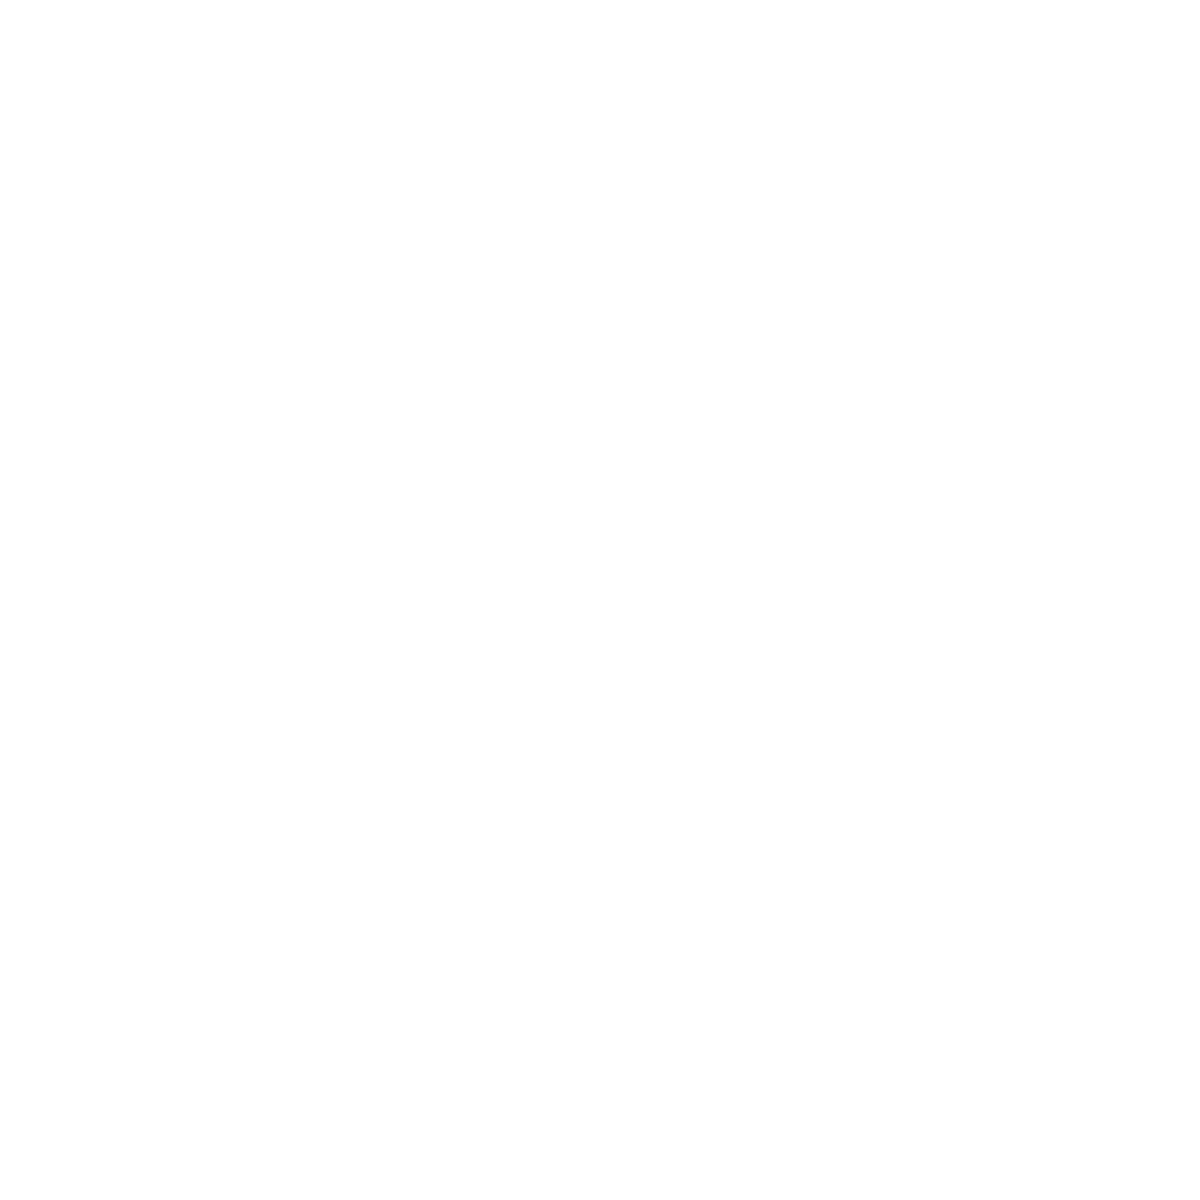 Giacovelli logo